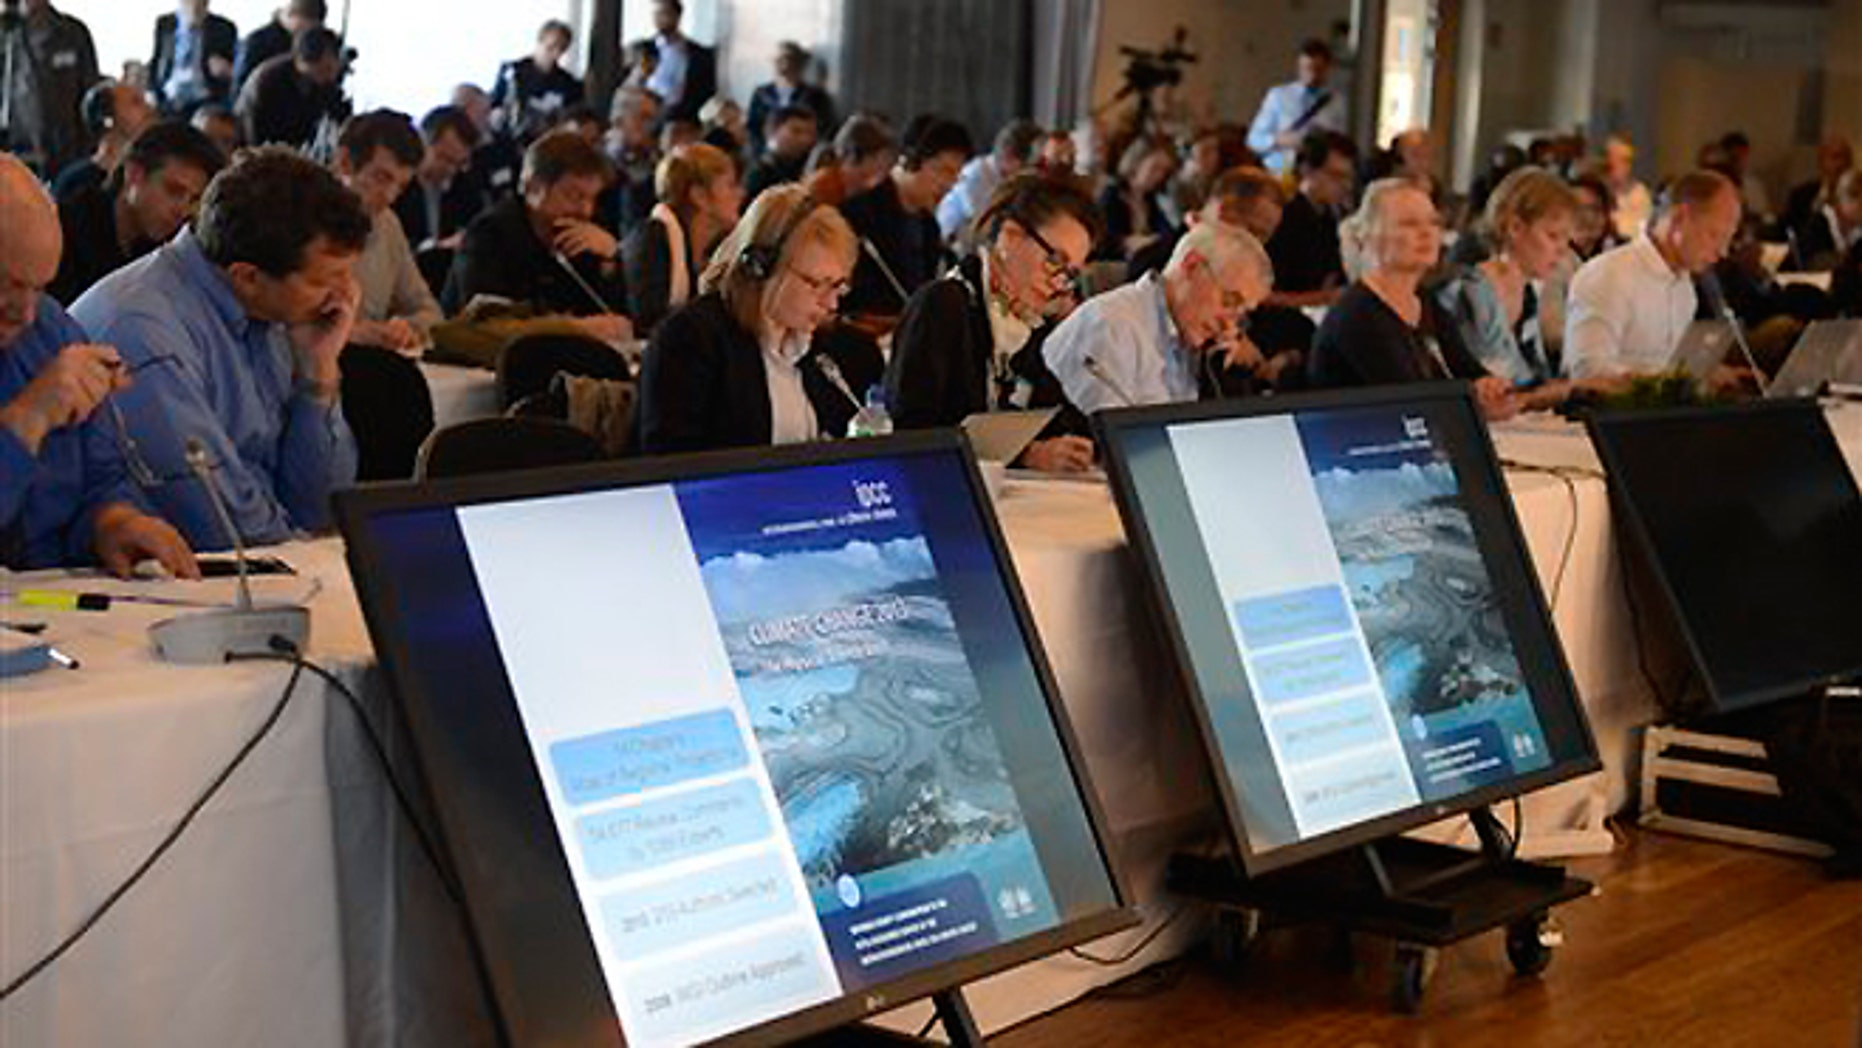 Sept. 27, 2013: Media representatives follow the U.N. IPCC climate report presentation, in Stockholm.